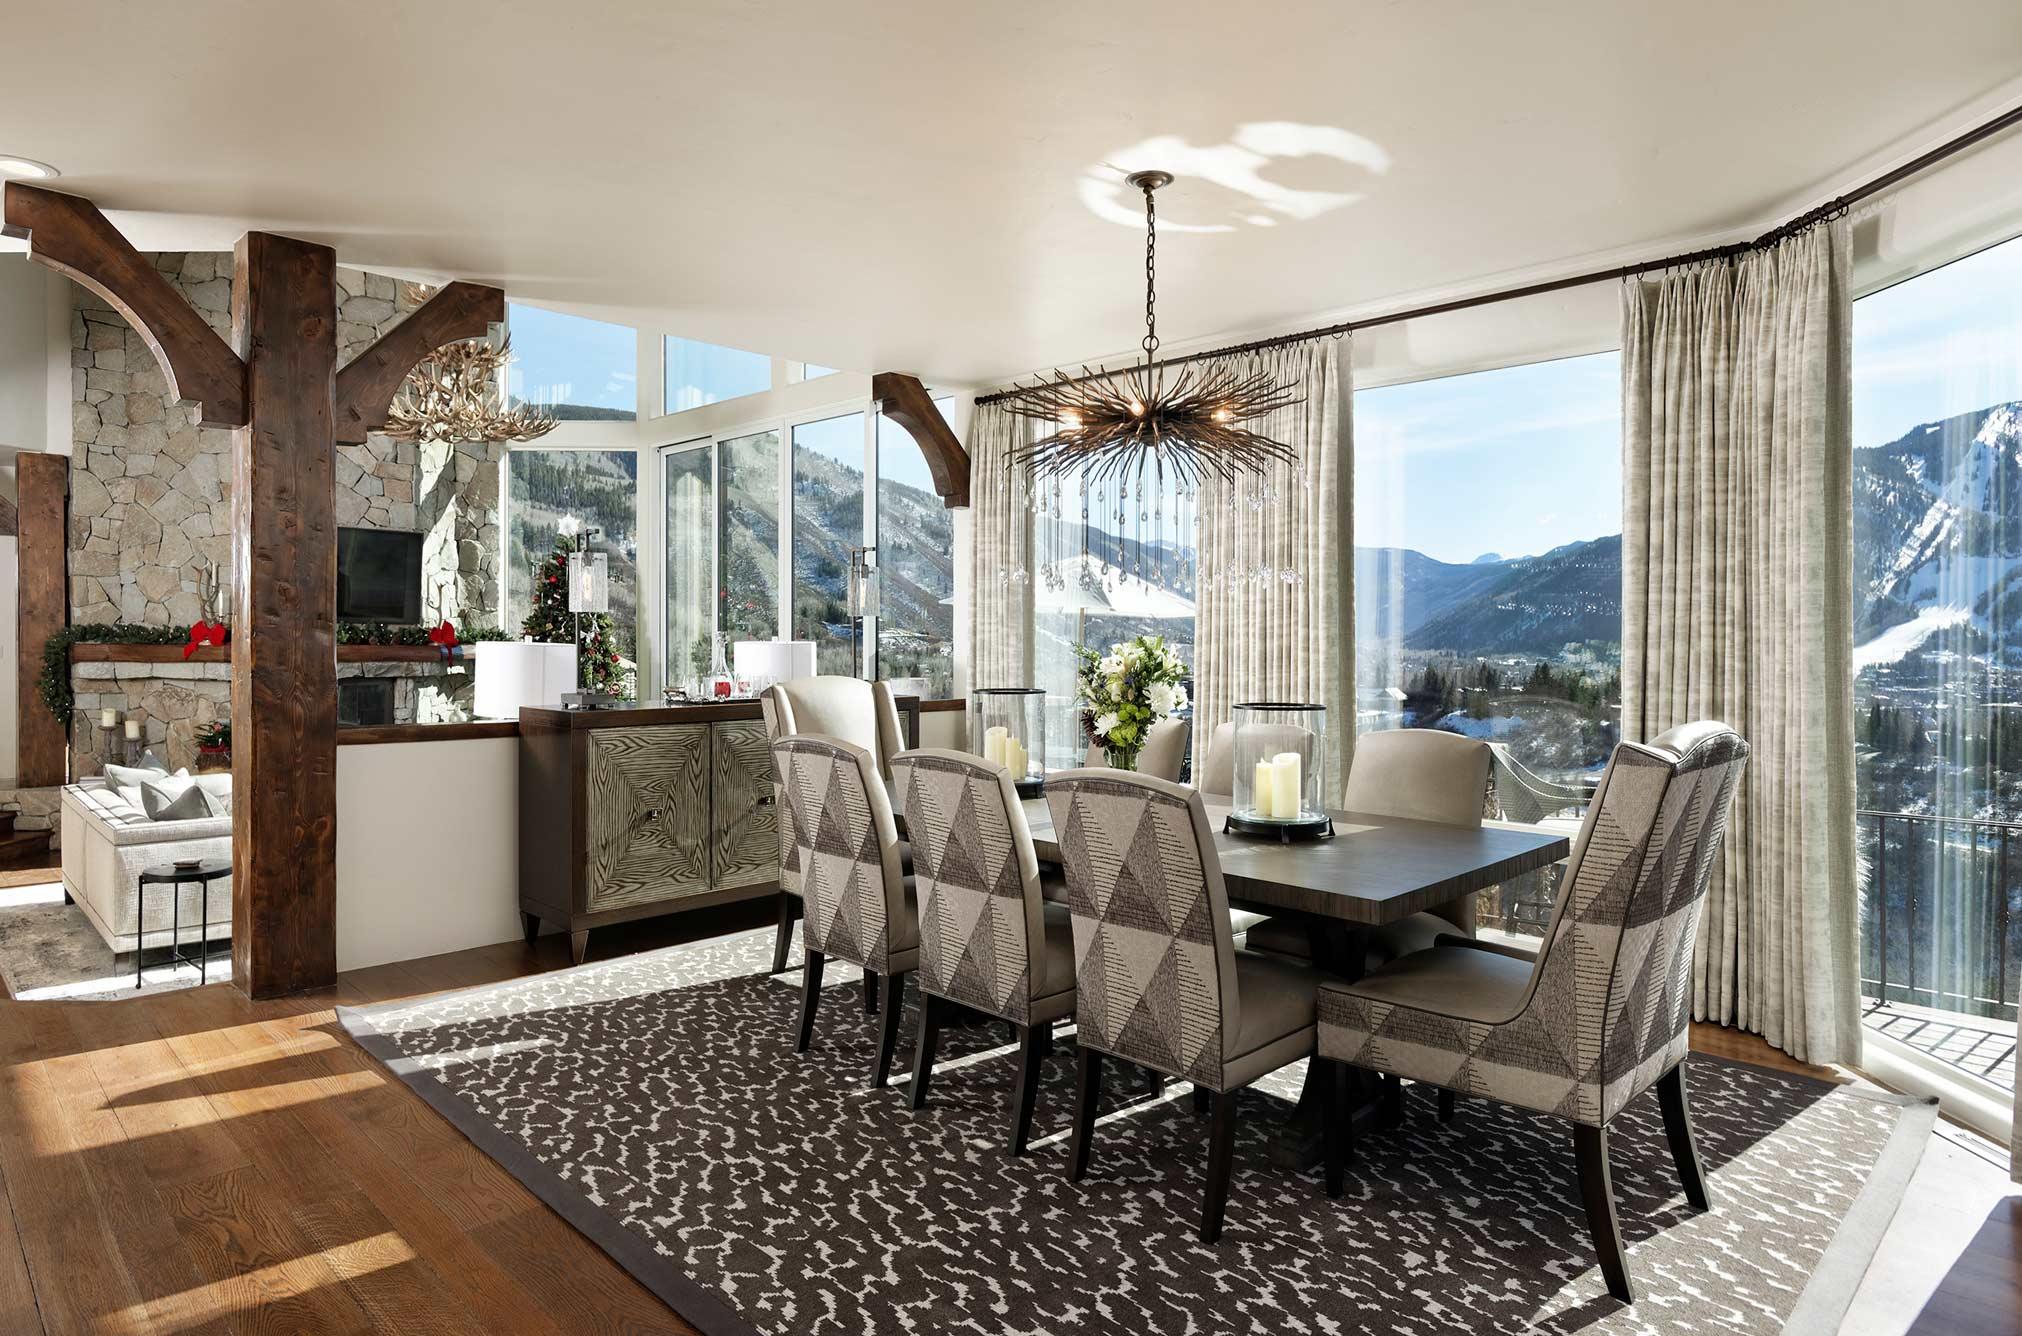 aspen colorado luxury home rental new years